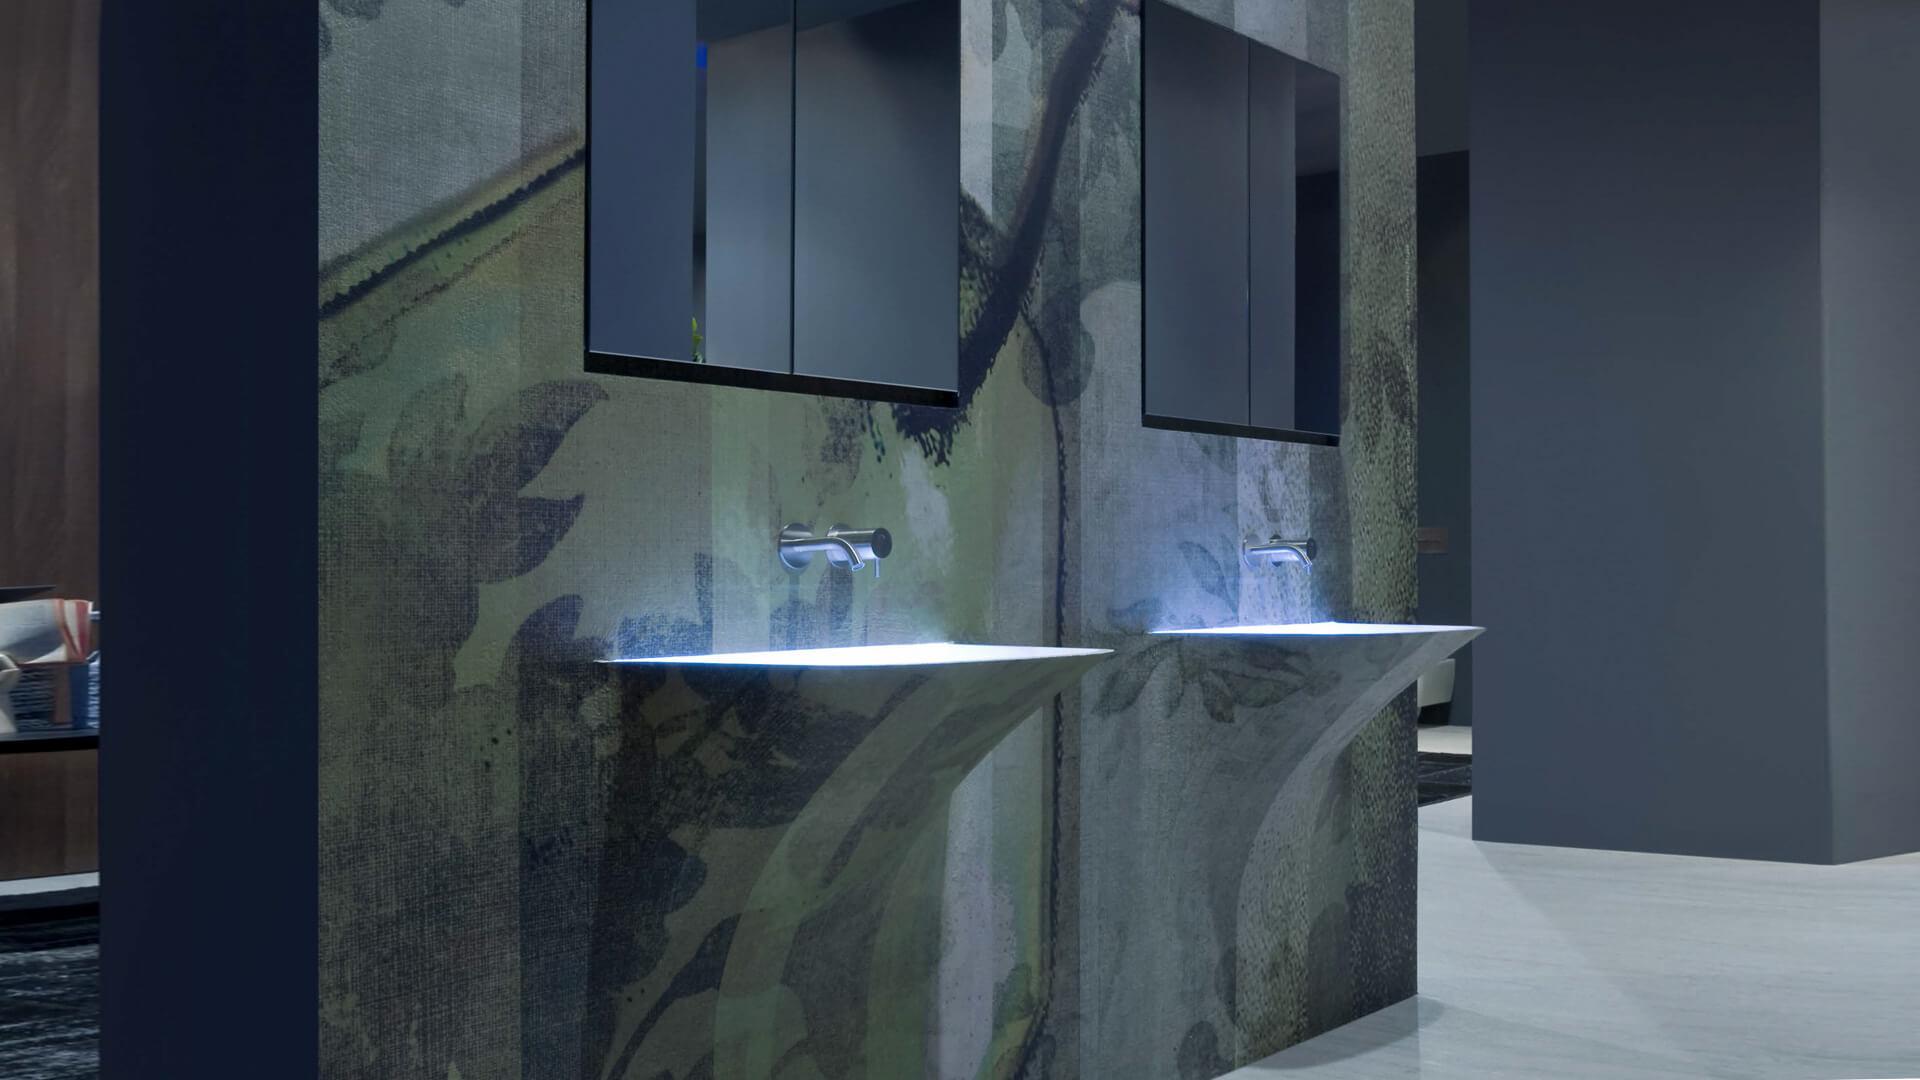 Luminous washing basins